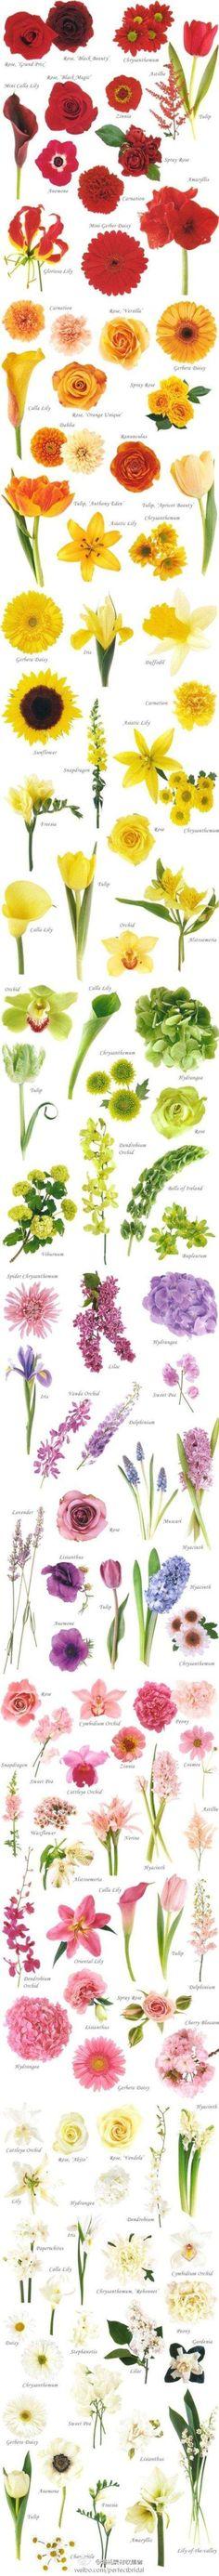 wedding flowers by wedding color palette / http://www.deerpearlflowers.com/wedding-planning-tips-for-wedding-flowers/3/